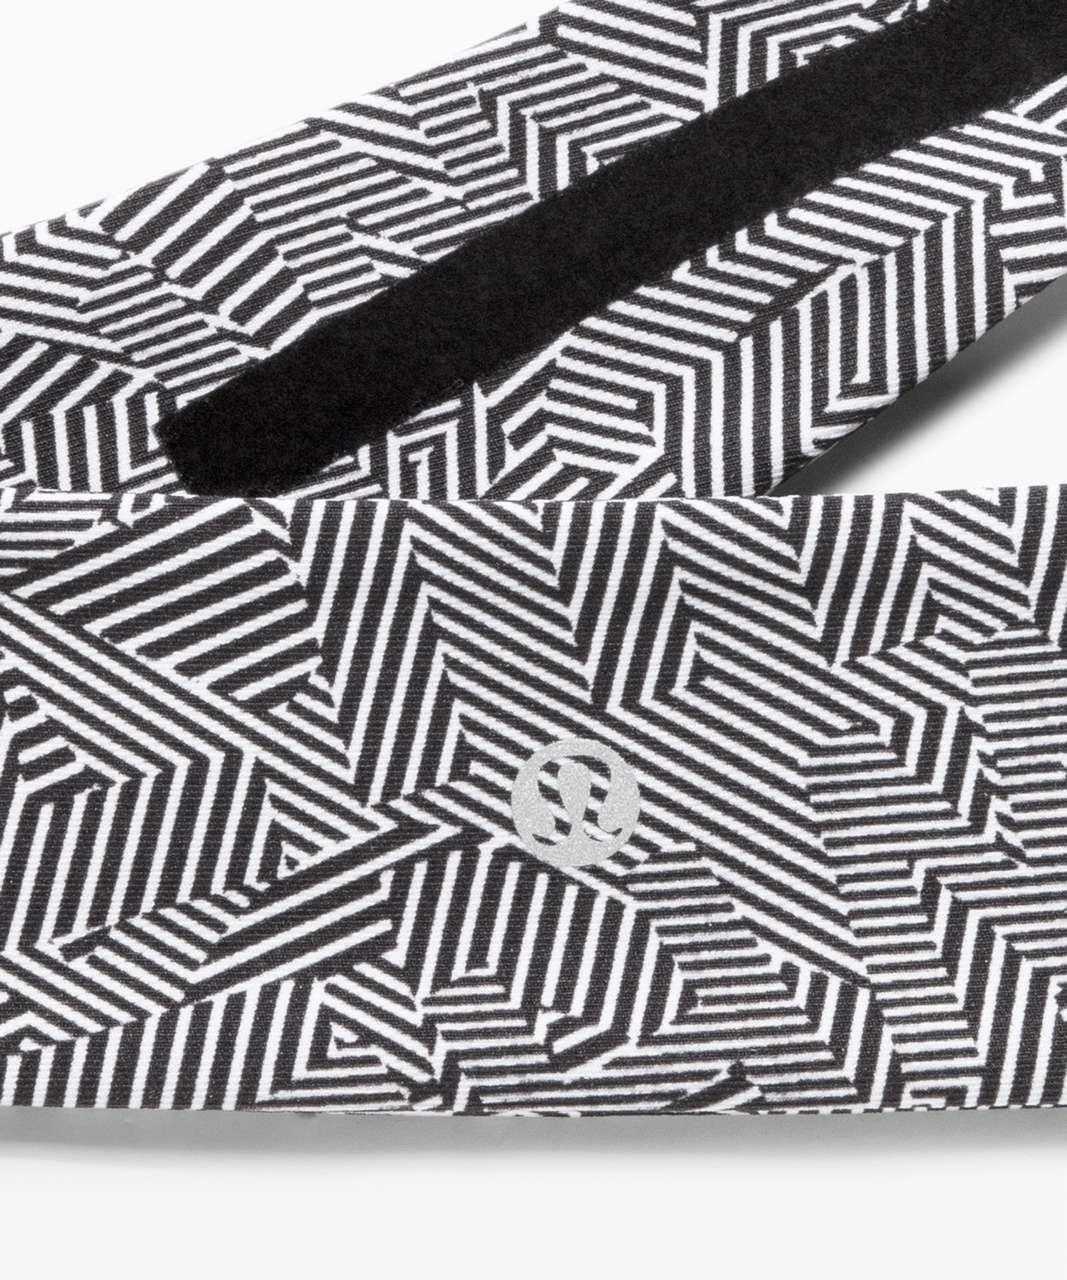 Lululemon Fly Away Tamer Headband II *SeaWheeze - Illusionary White Black